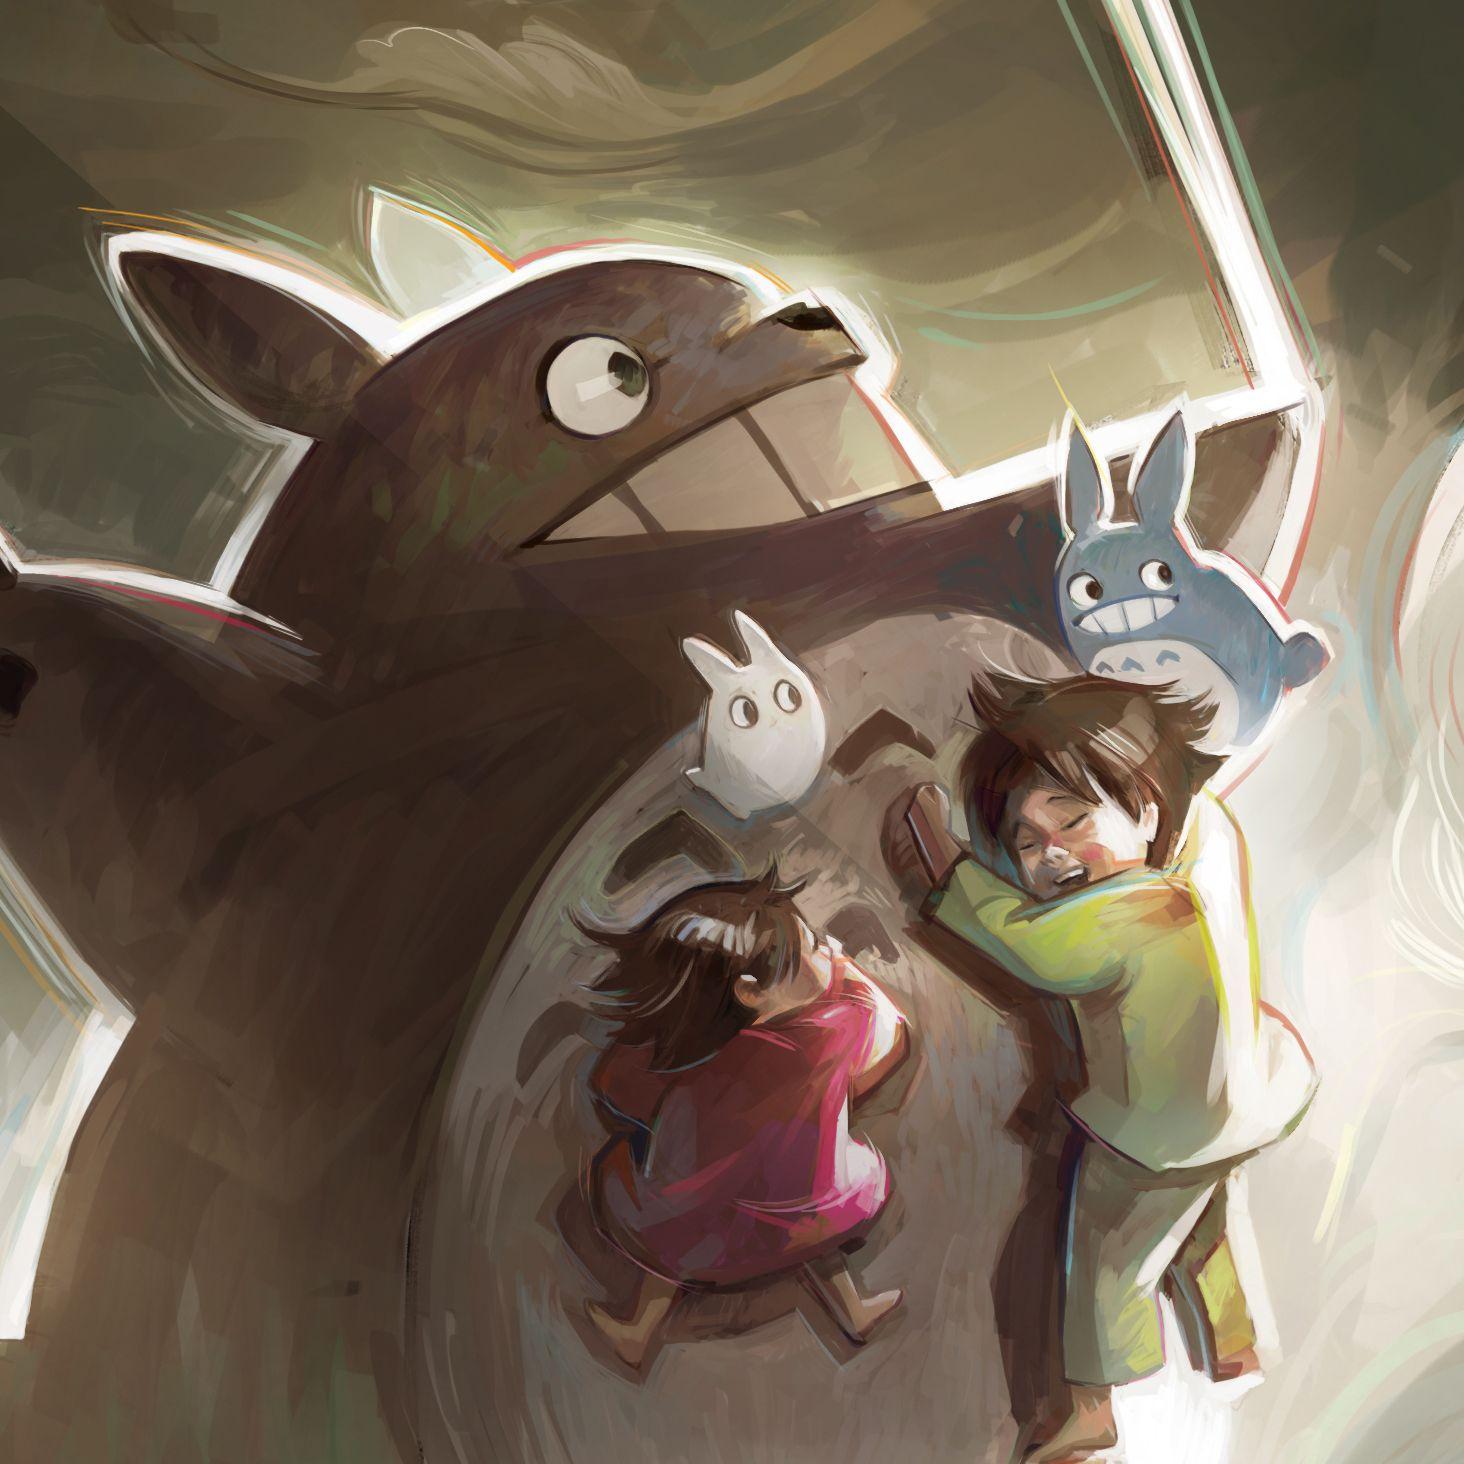 Fan art of the movie My Neighbour Totoro, a Ghibli film.